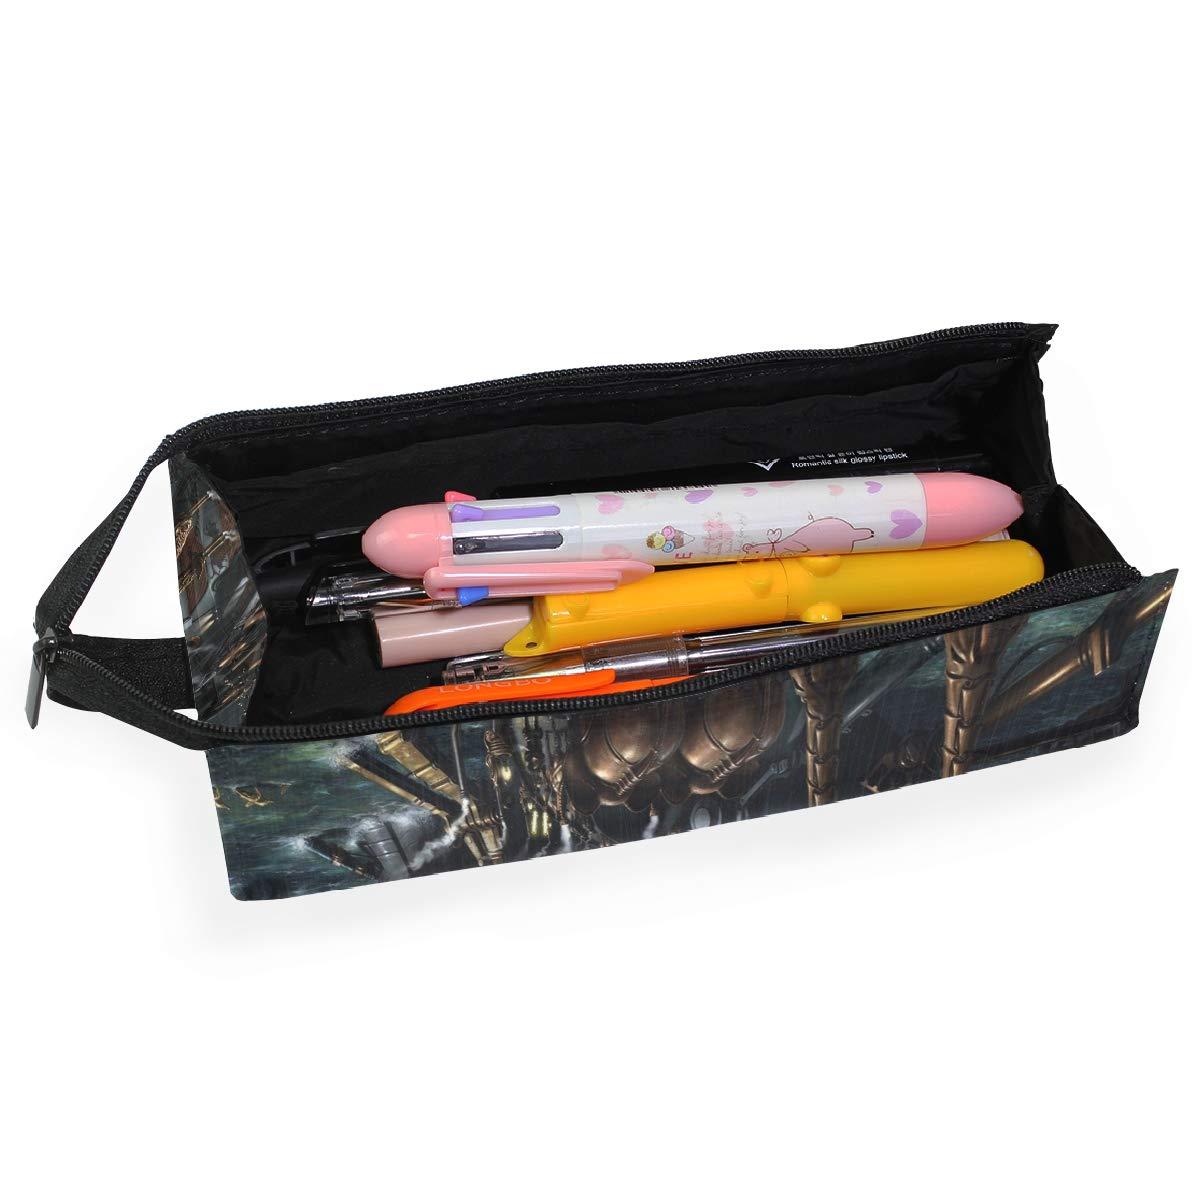 Glasses Case Bunny The Rabbit Painting Travel Soft Sunglasses Pencil Bag Protective Purse